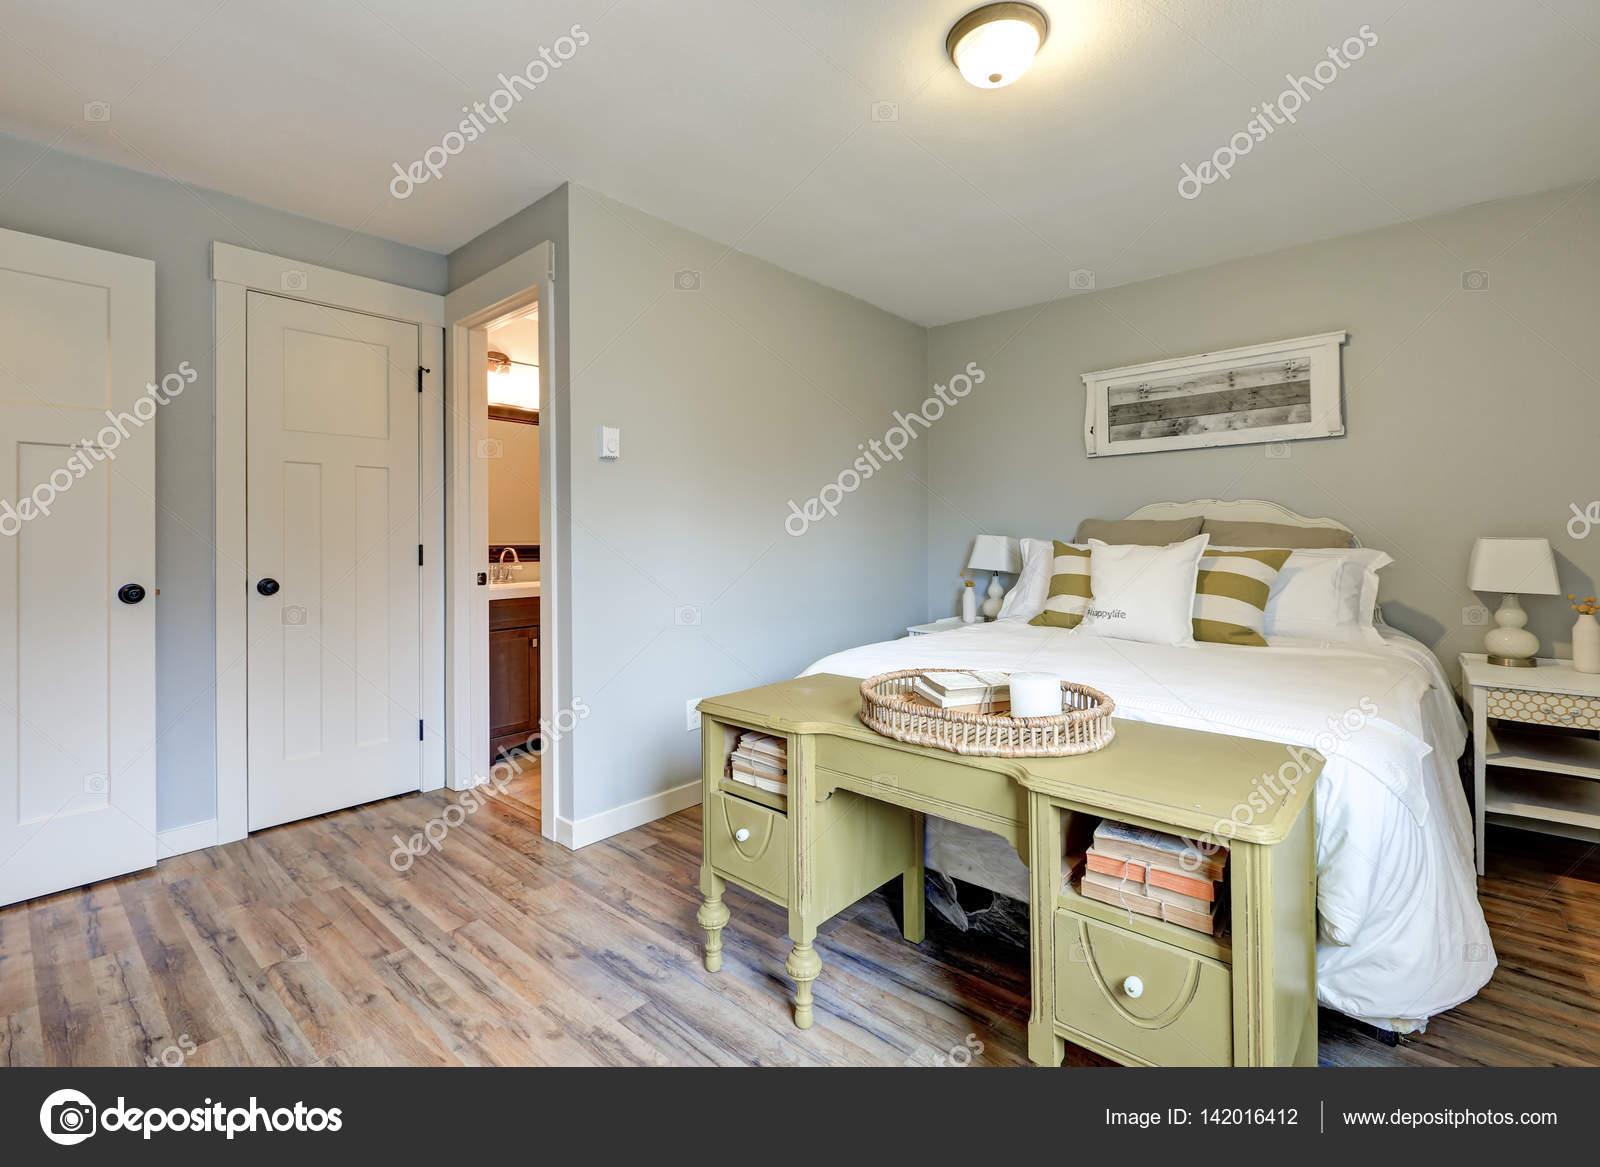 Slaapkamer Interieur Grijs : Mooie bleke grijze slaapkamer interieur u stockfoto iriana w